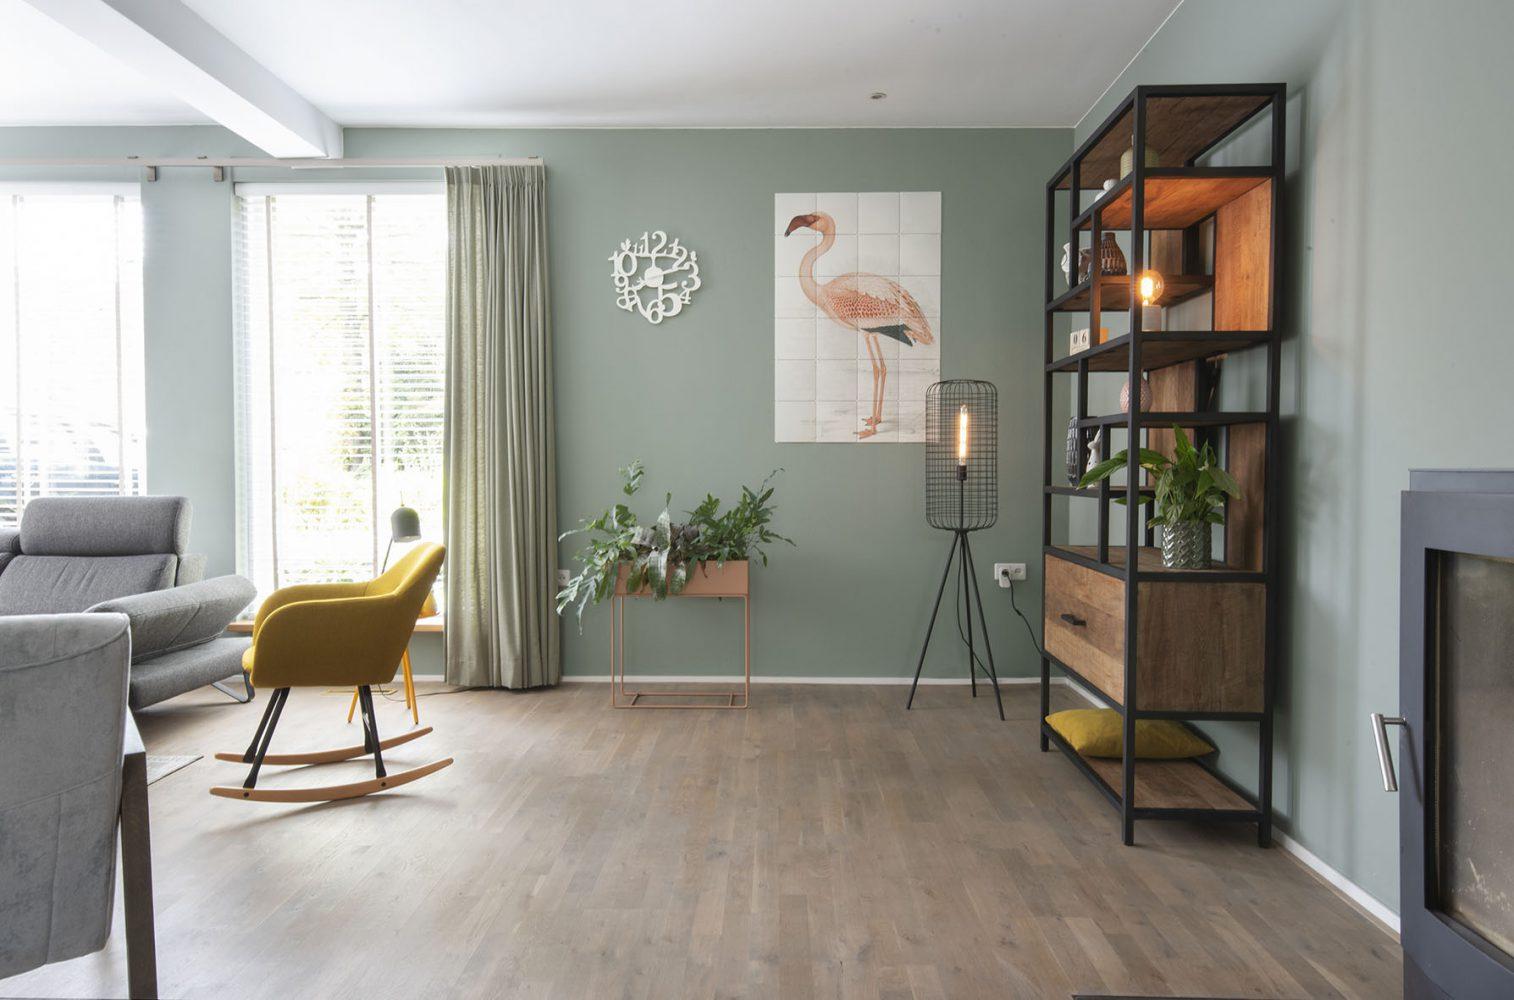 Huiskamer interieuradvies Drunen styling studiok2k binnenhuisarchitect